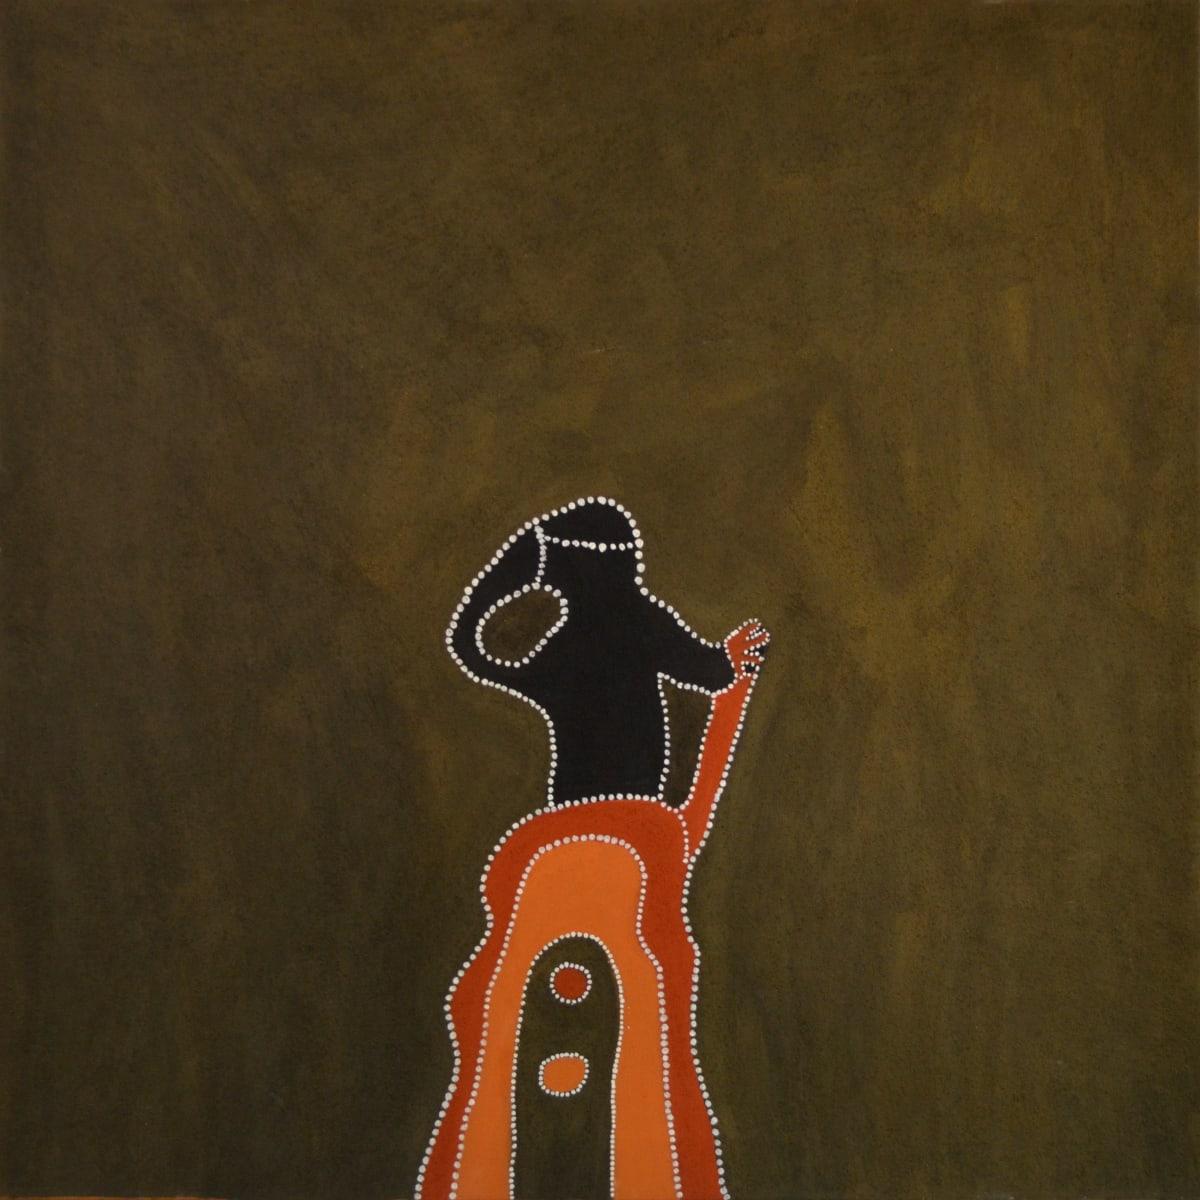 Mabel Juli MARRANYJI DU JIYIRRINY natural ochre and pigments on canvas 120 x 120 cm